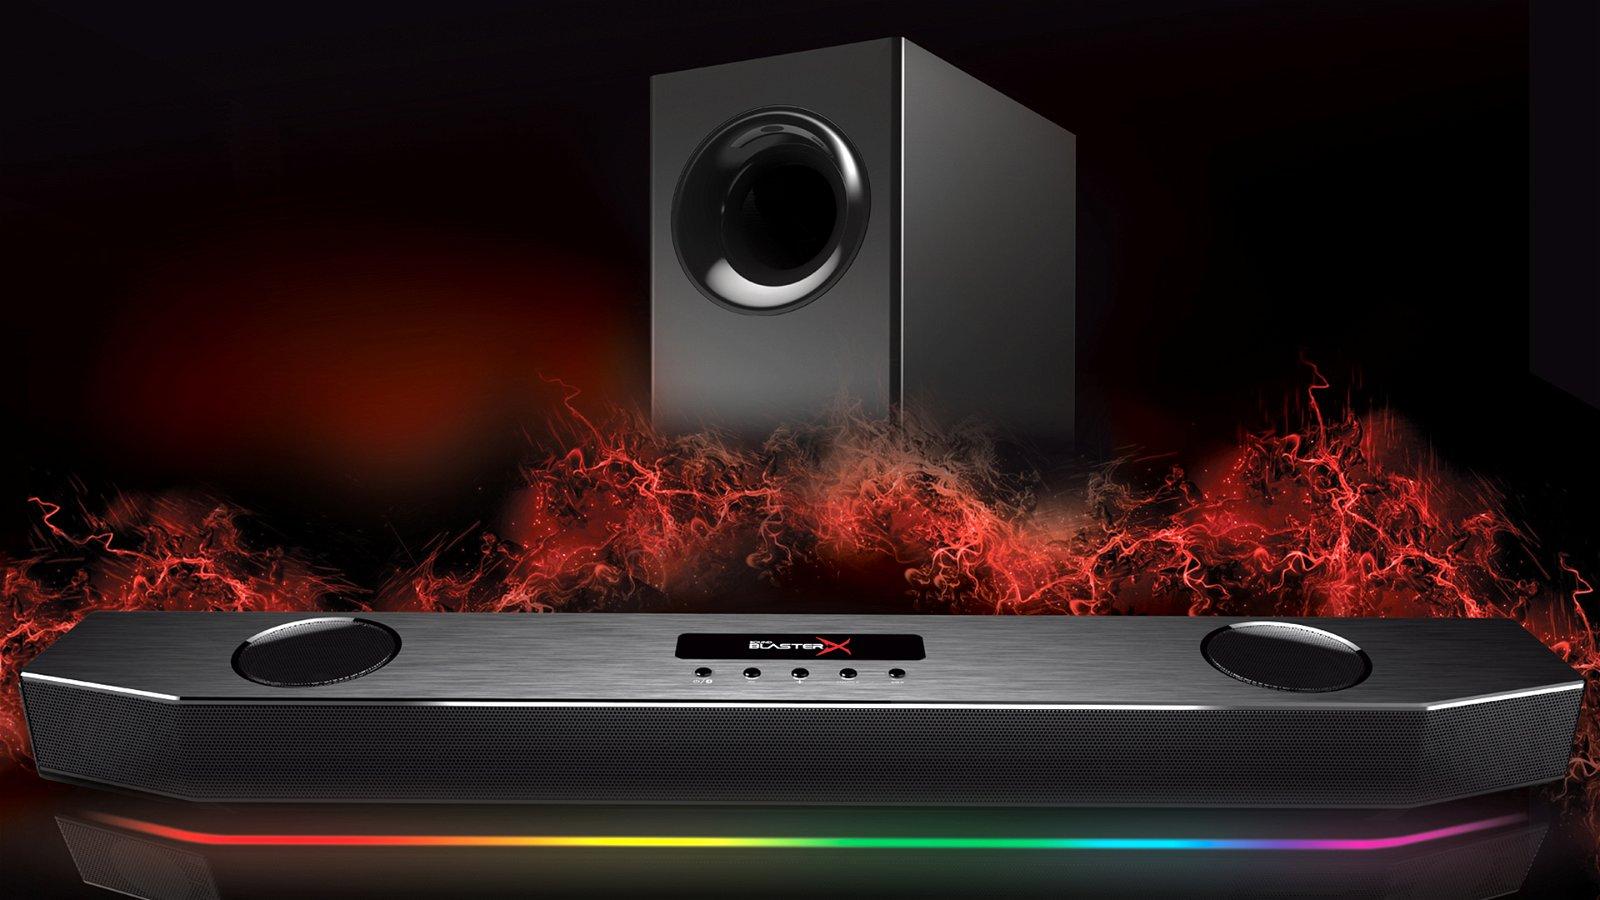 Creative Sound Blasterx Katana (Soundbar) Review - Big Sound, Small Package 5